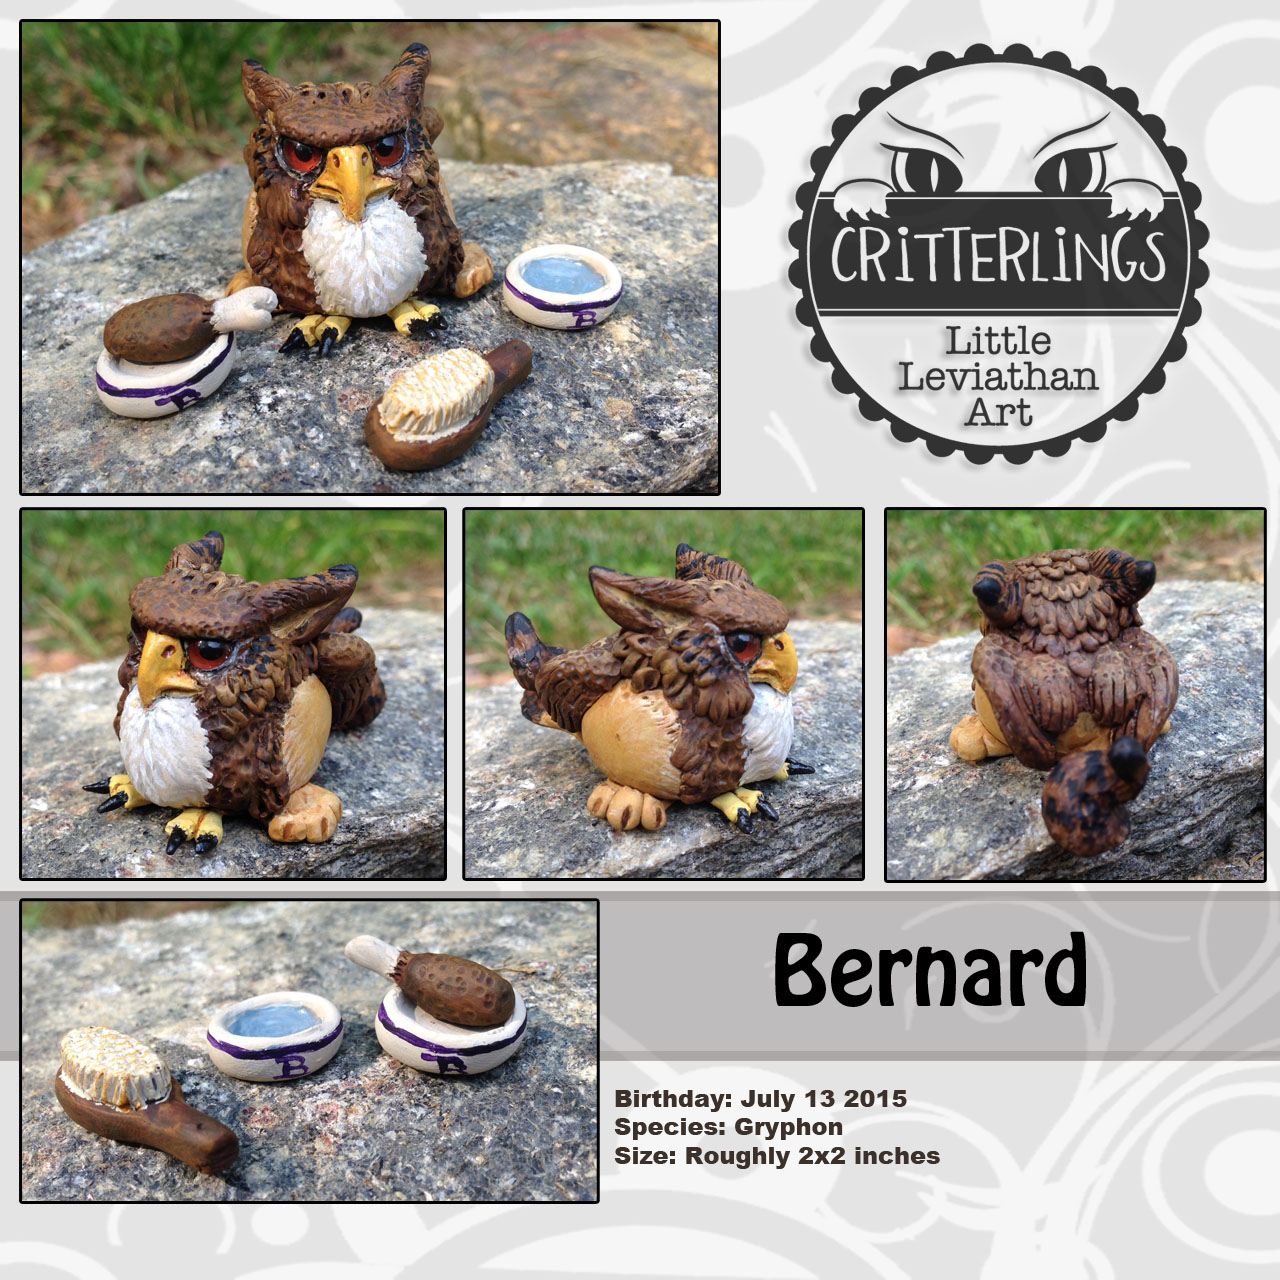 Bernard01